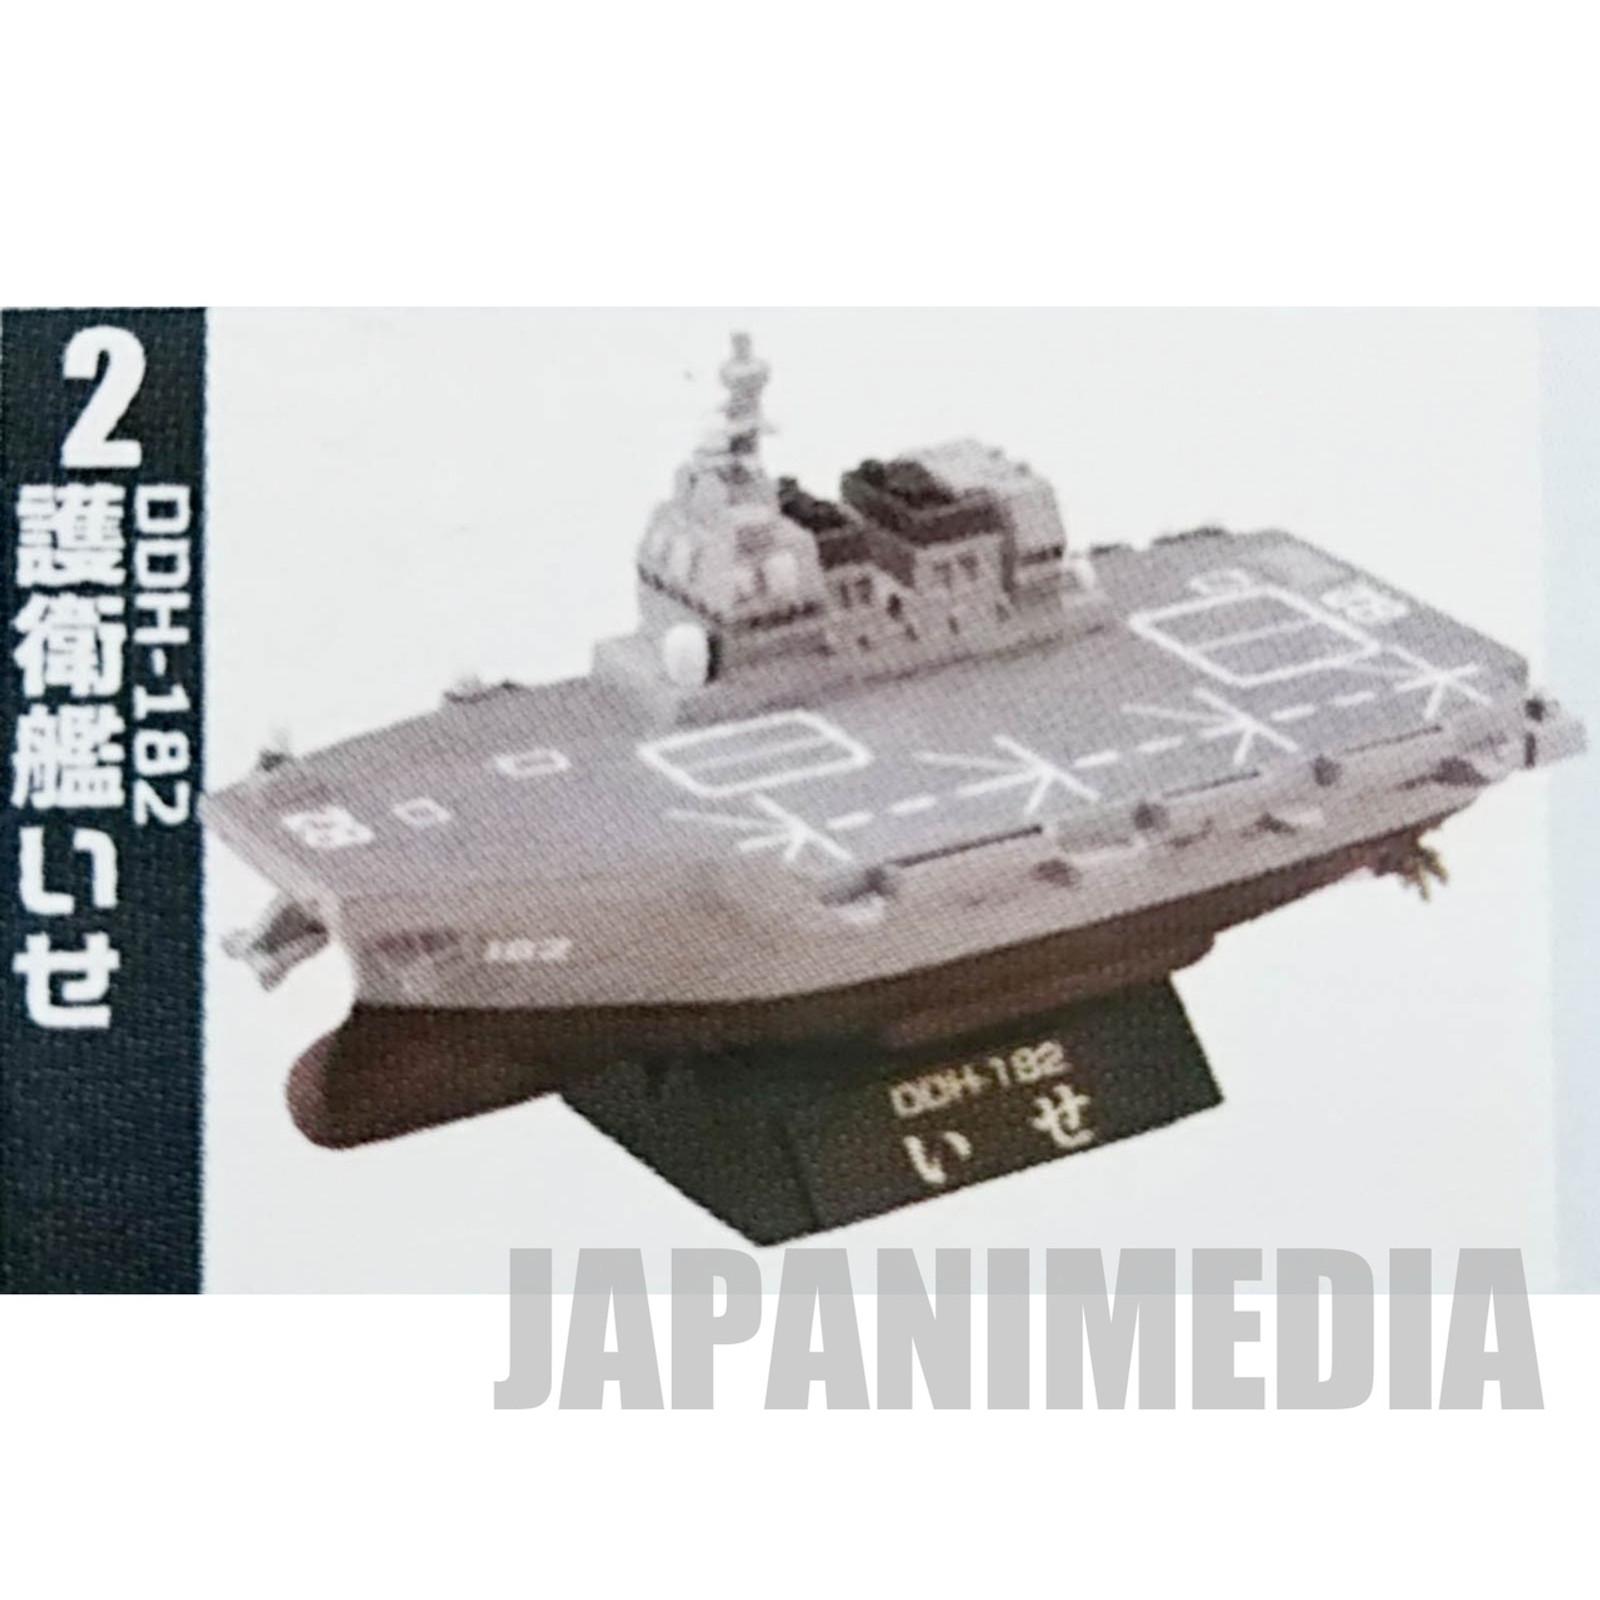 Chibi Scale Escort Ship Ise Type DDH-182 Miniature Figure Kaiyodo F-Toys JAPAN